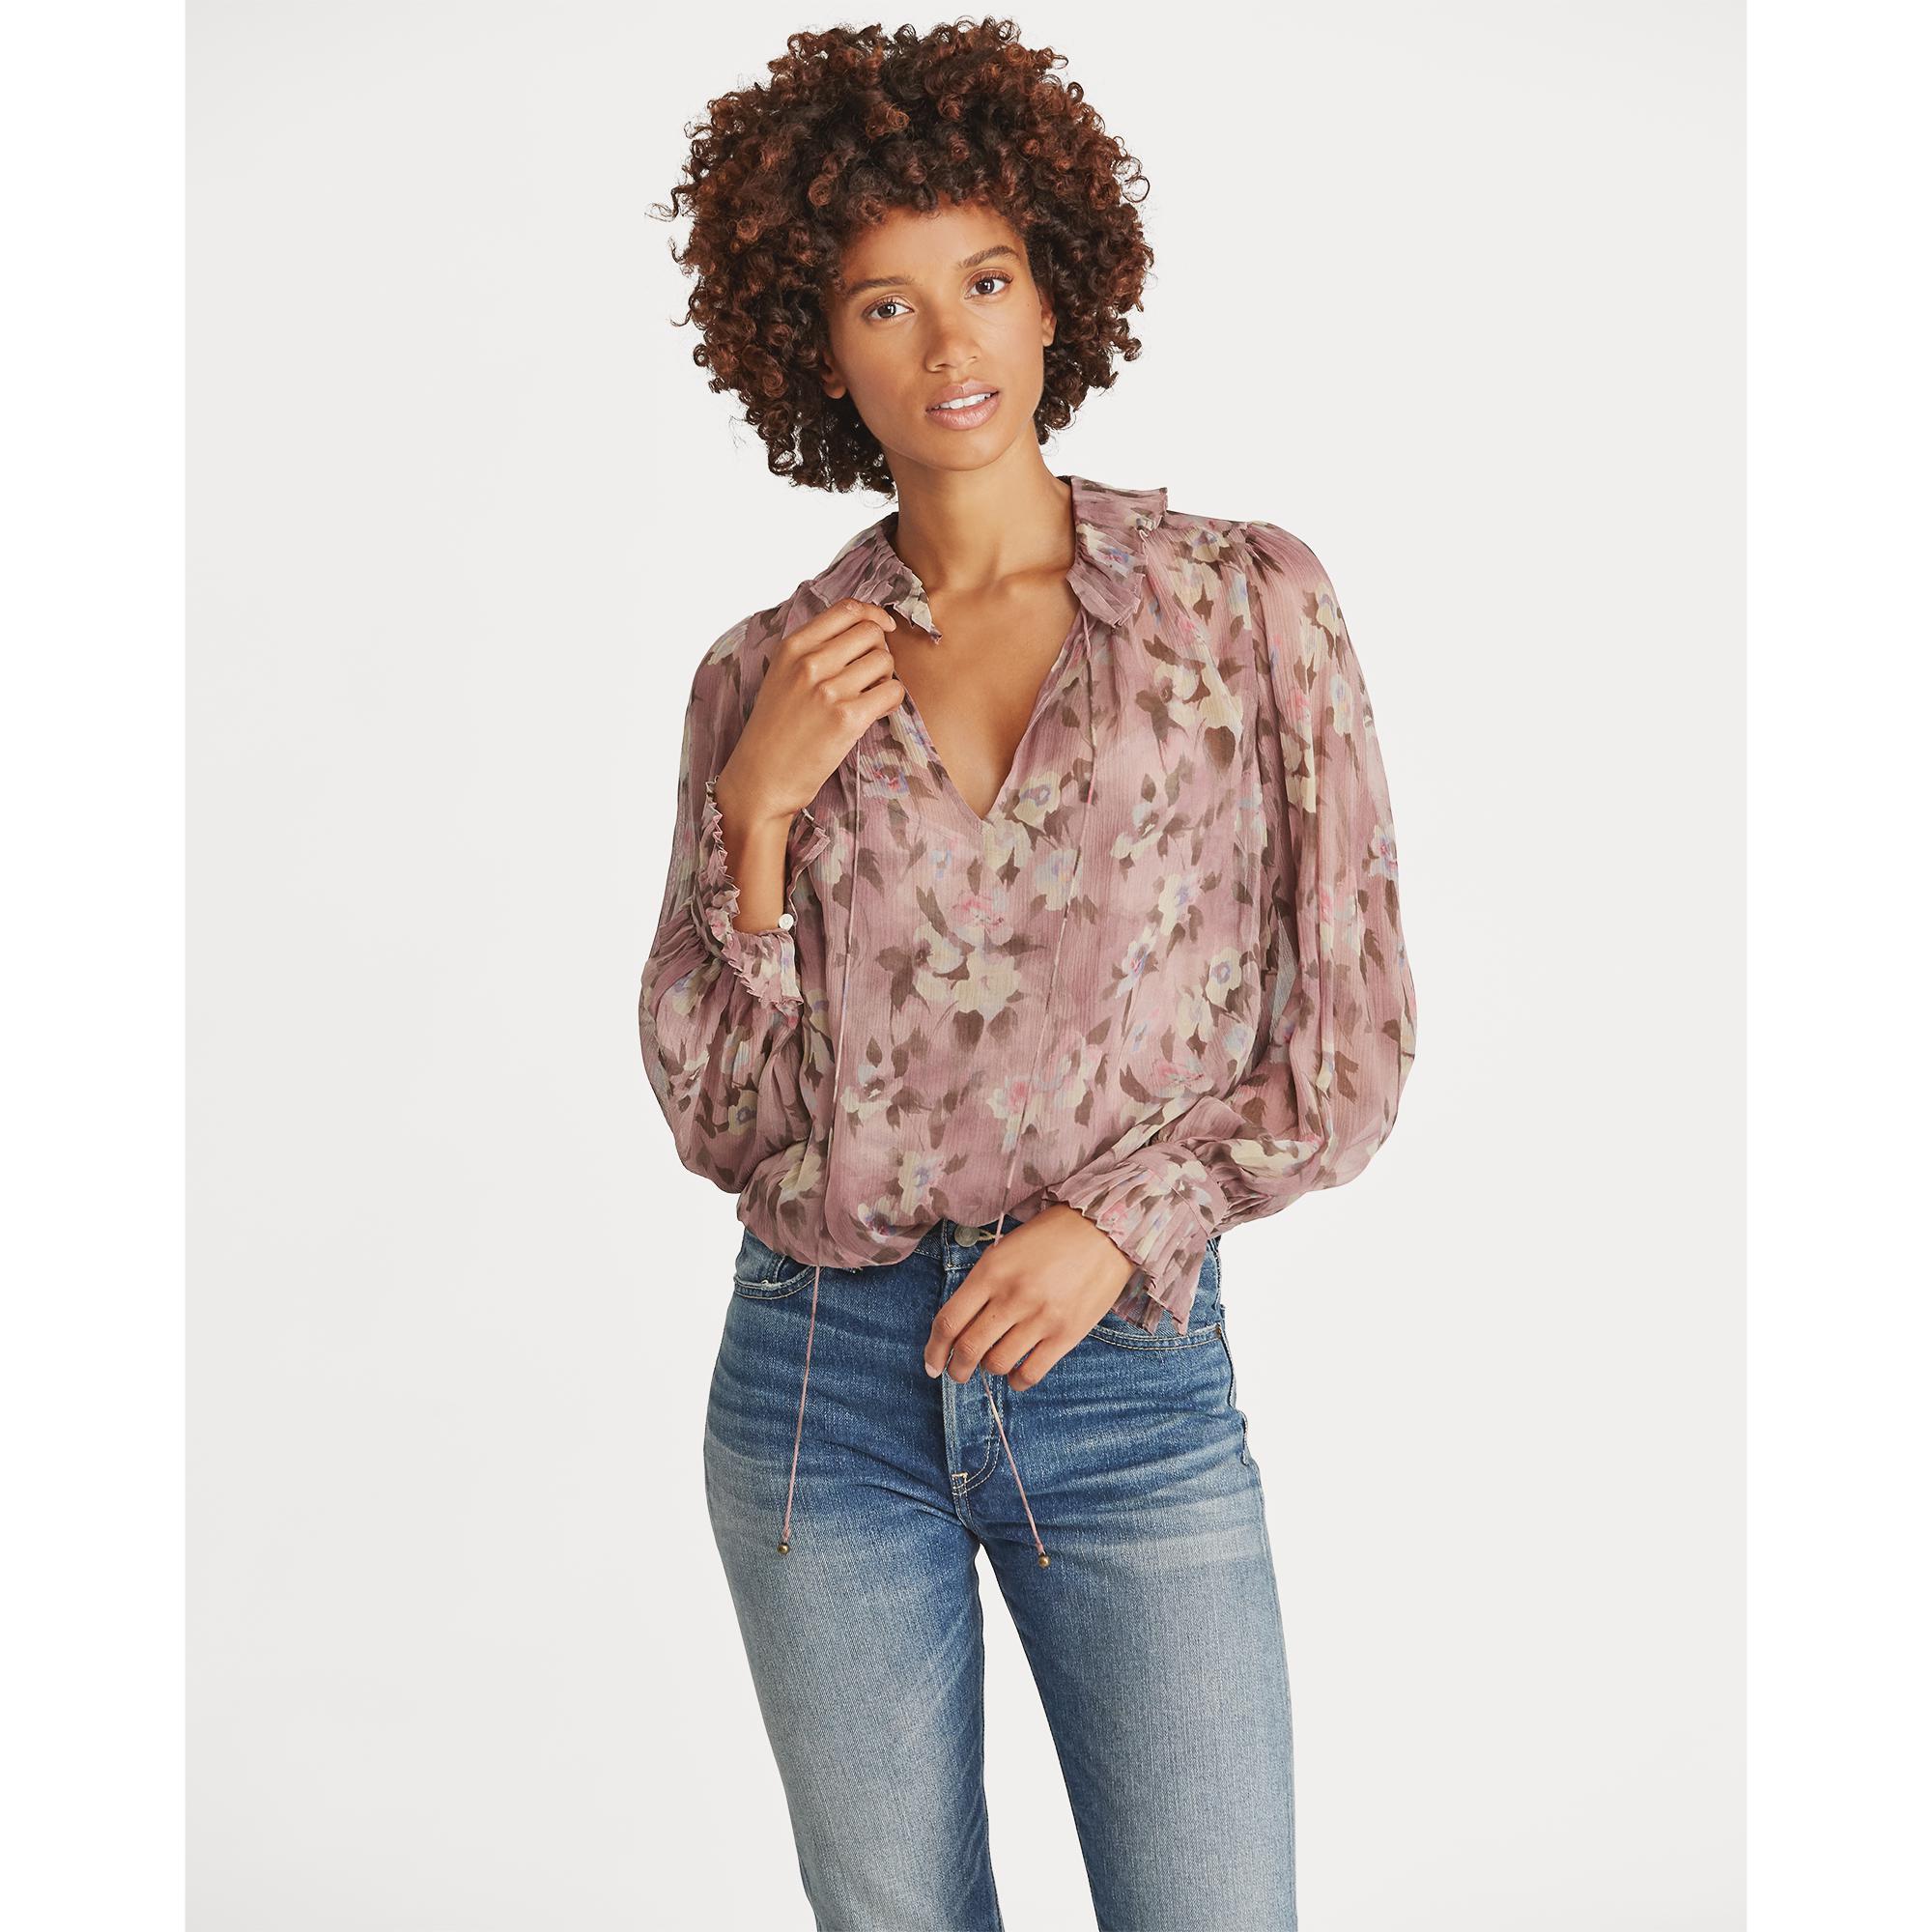 9b9b660ea17d29 Lyst - Polo Ralph Lauren Floral Silk Blouse